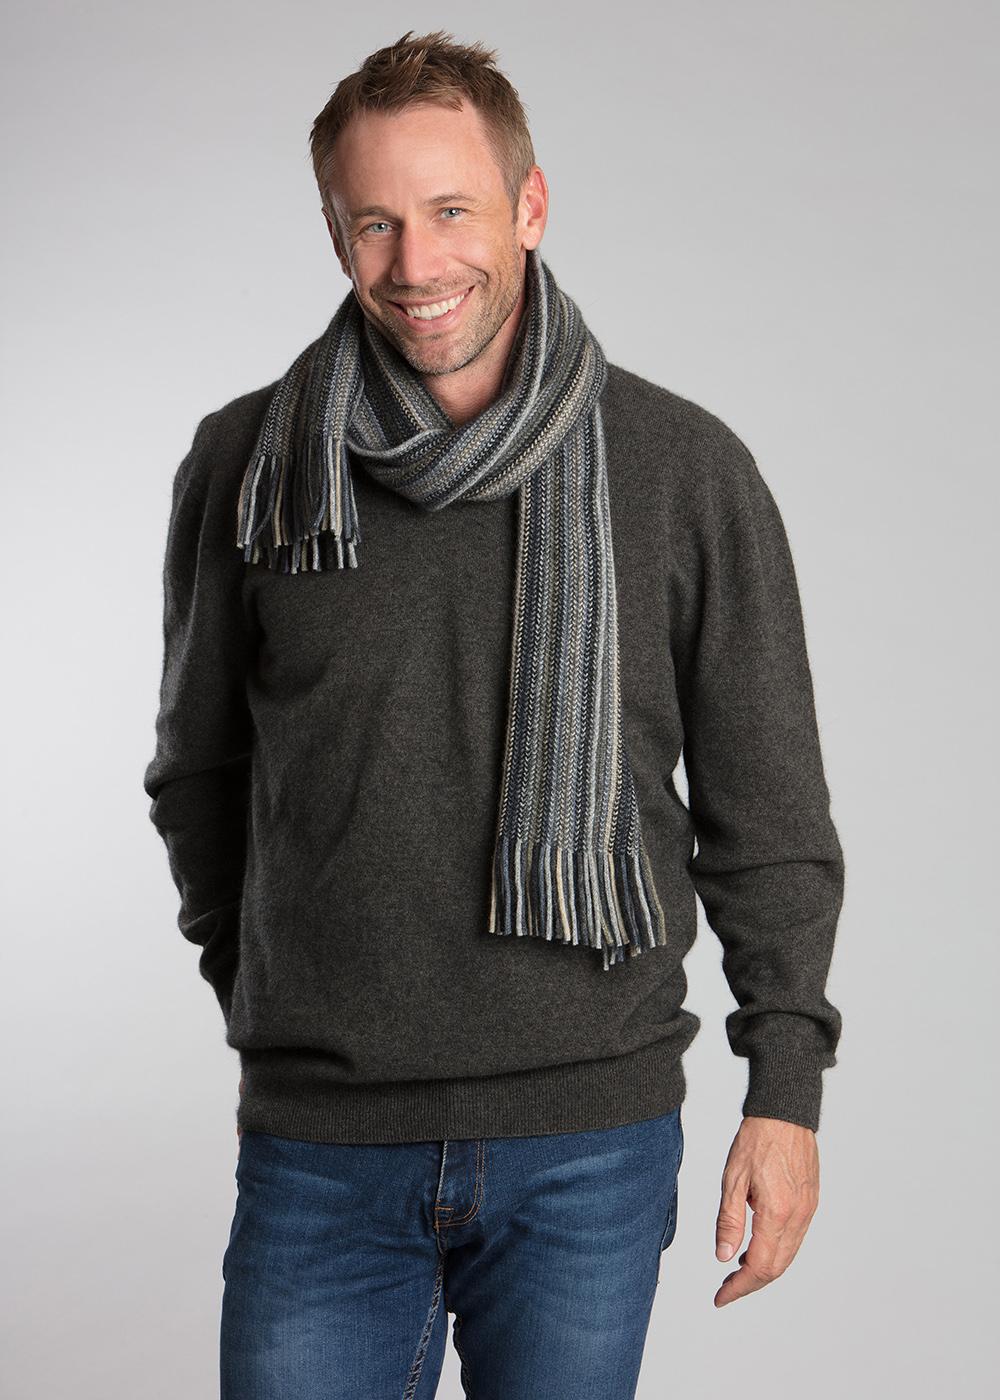 Possum Merino Multi Stripe Scarf Knitwear Accessories Ecowool